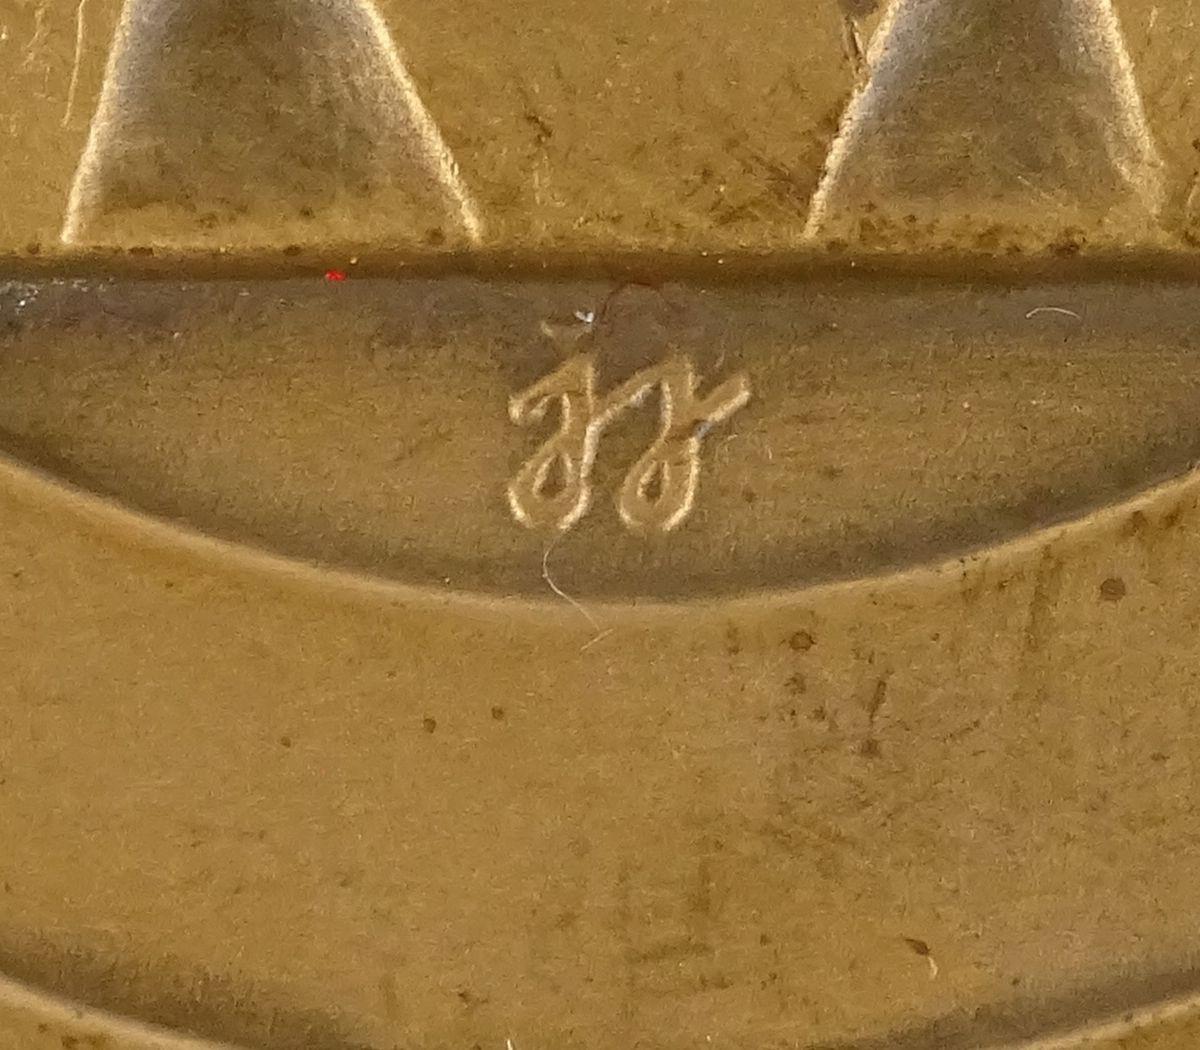 DSC05448.JPG (1200×1050)